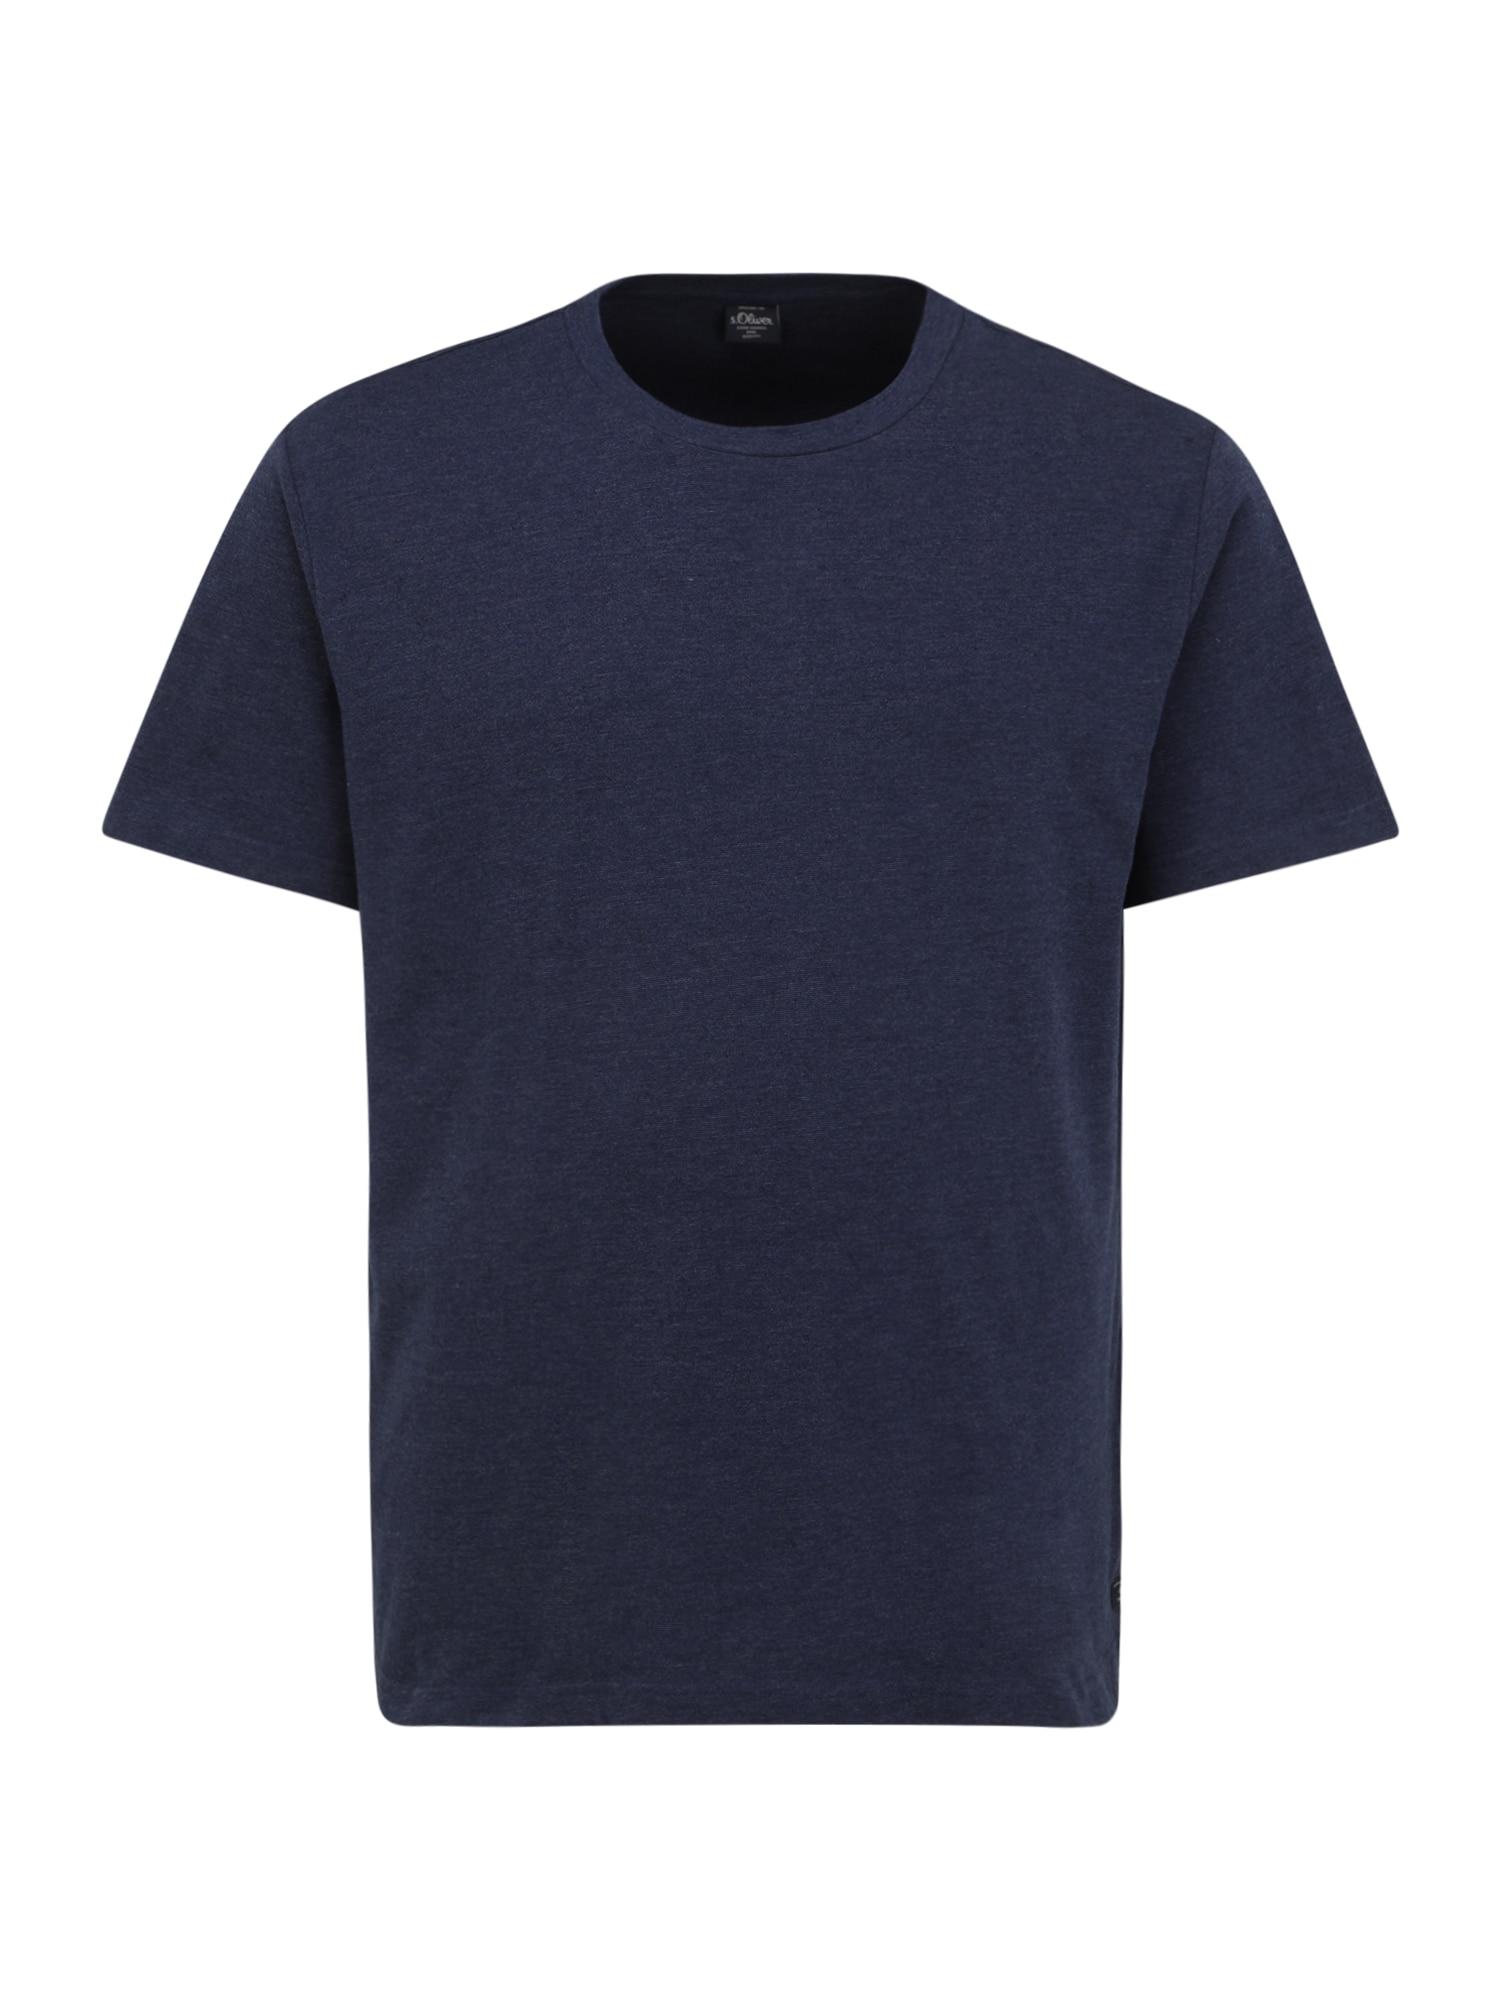 s.Oliver BLACK LABEL Marškinėliai mėlyna